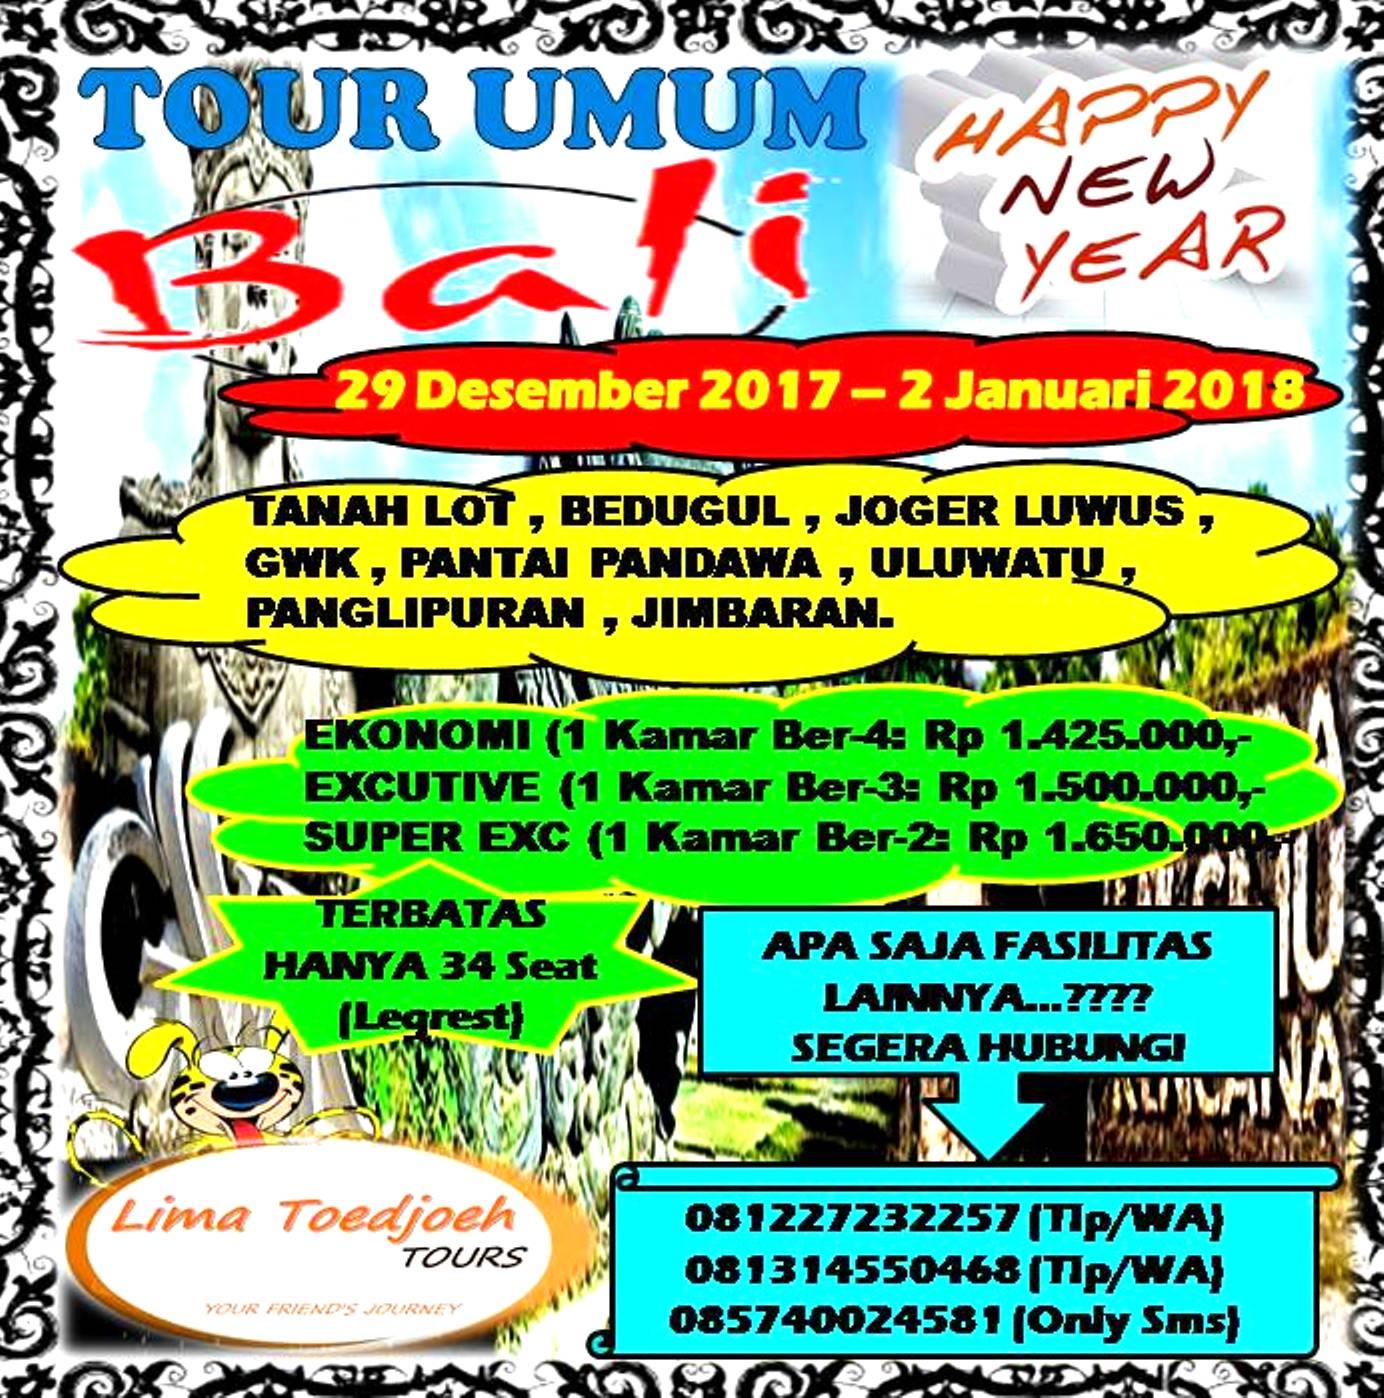 BALI TOUR UMUM 2018